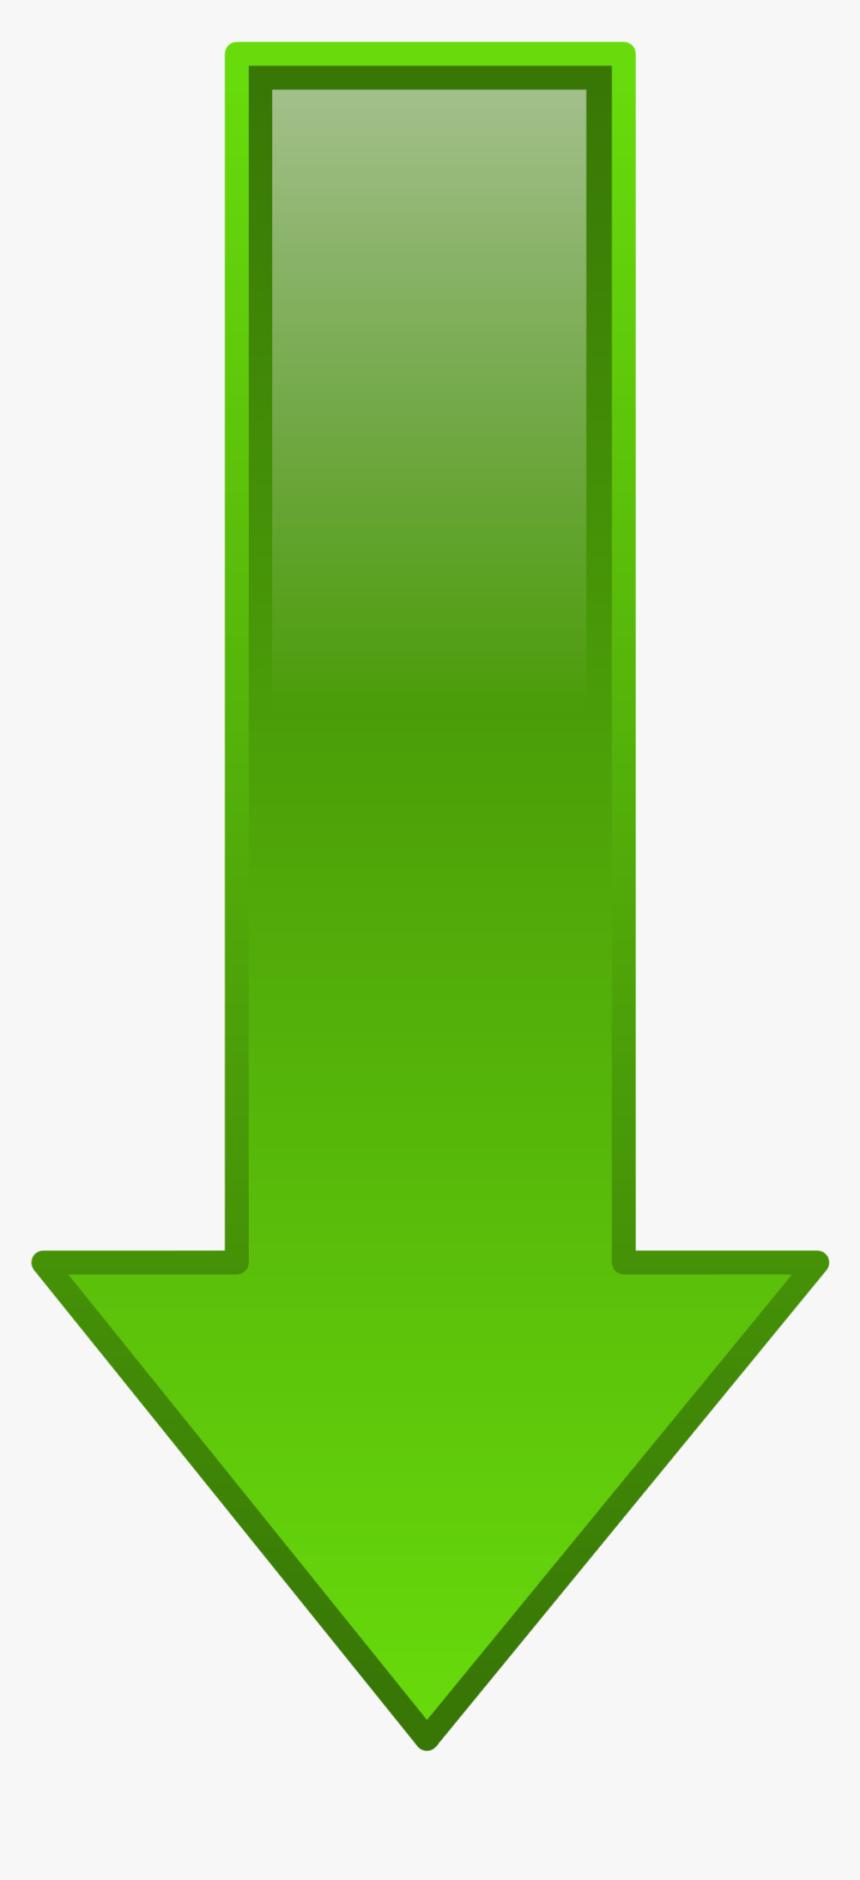 Arrow Down Green - Green Arrow Down, HD Png Download, Free Download